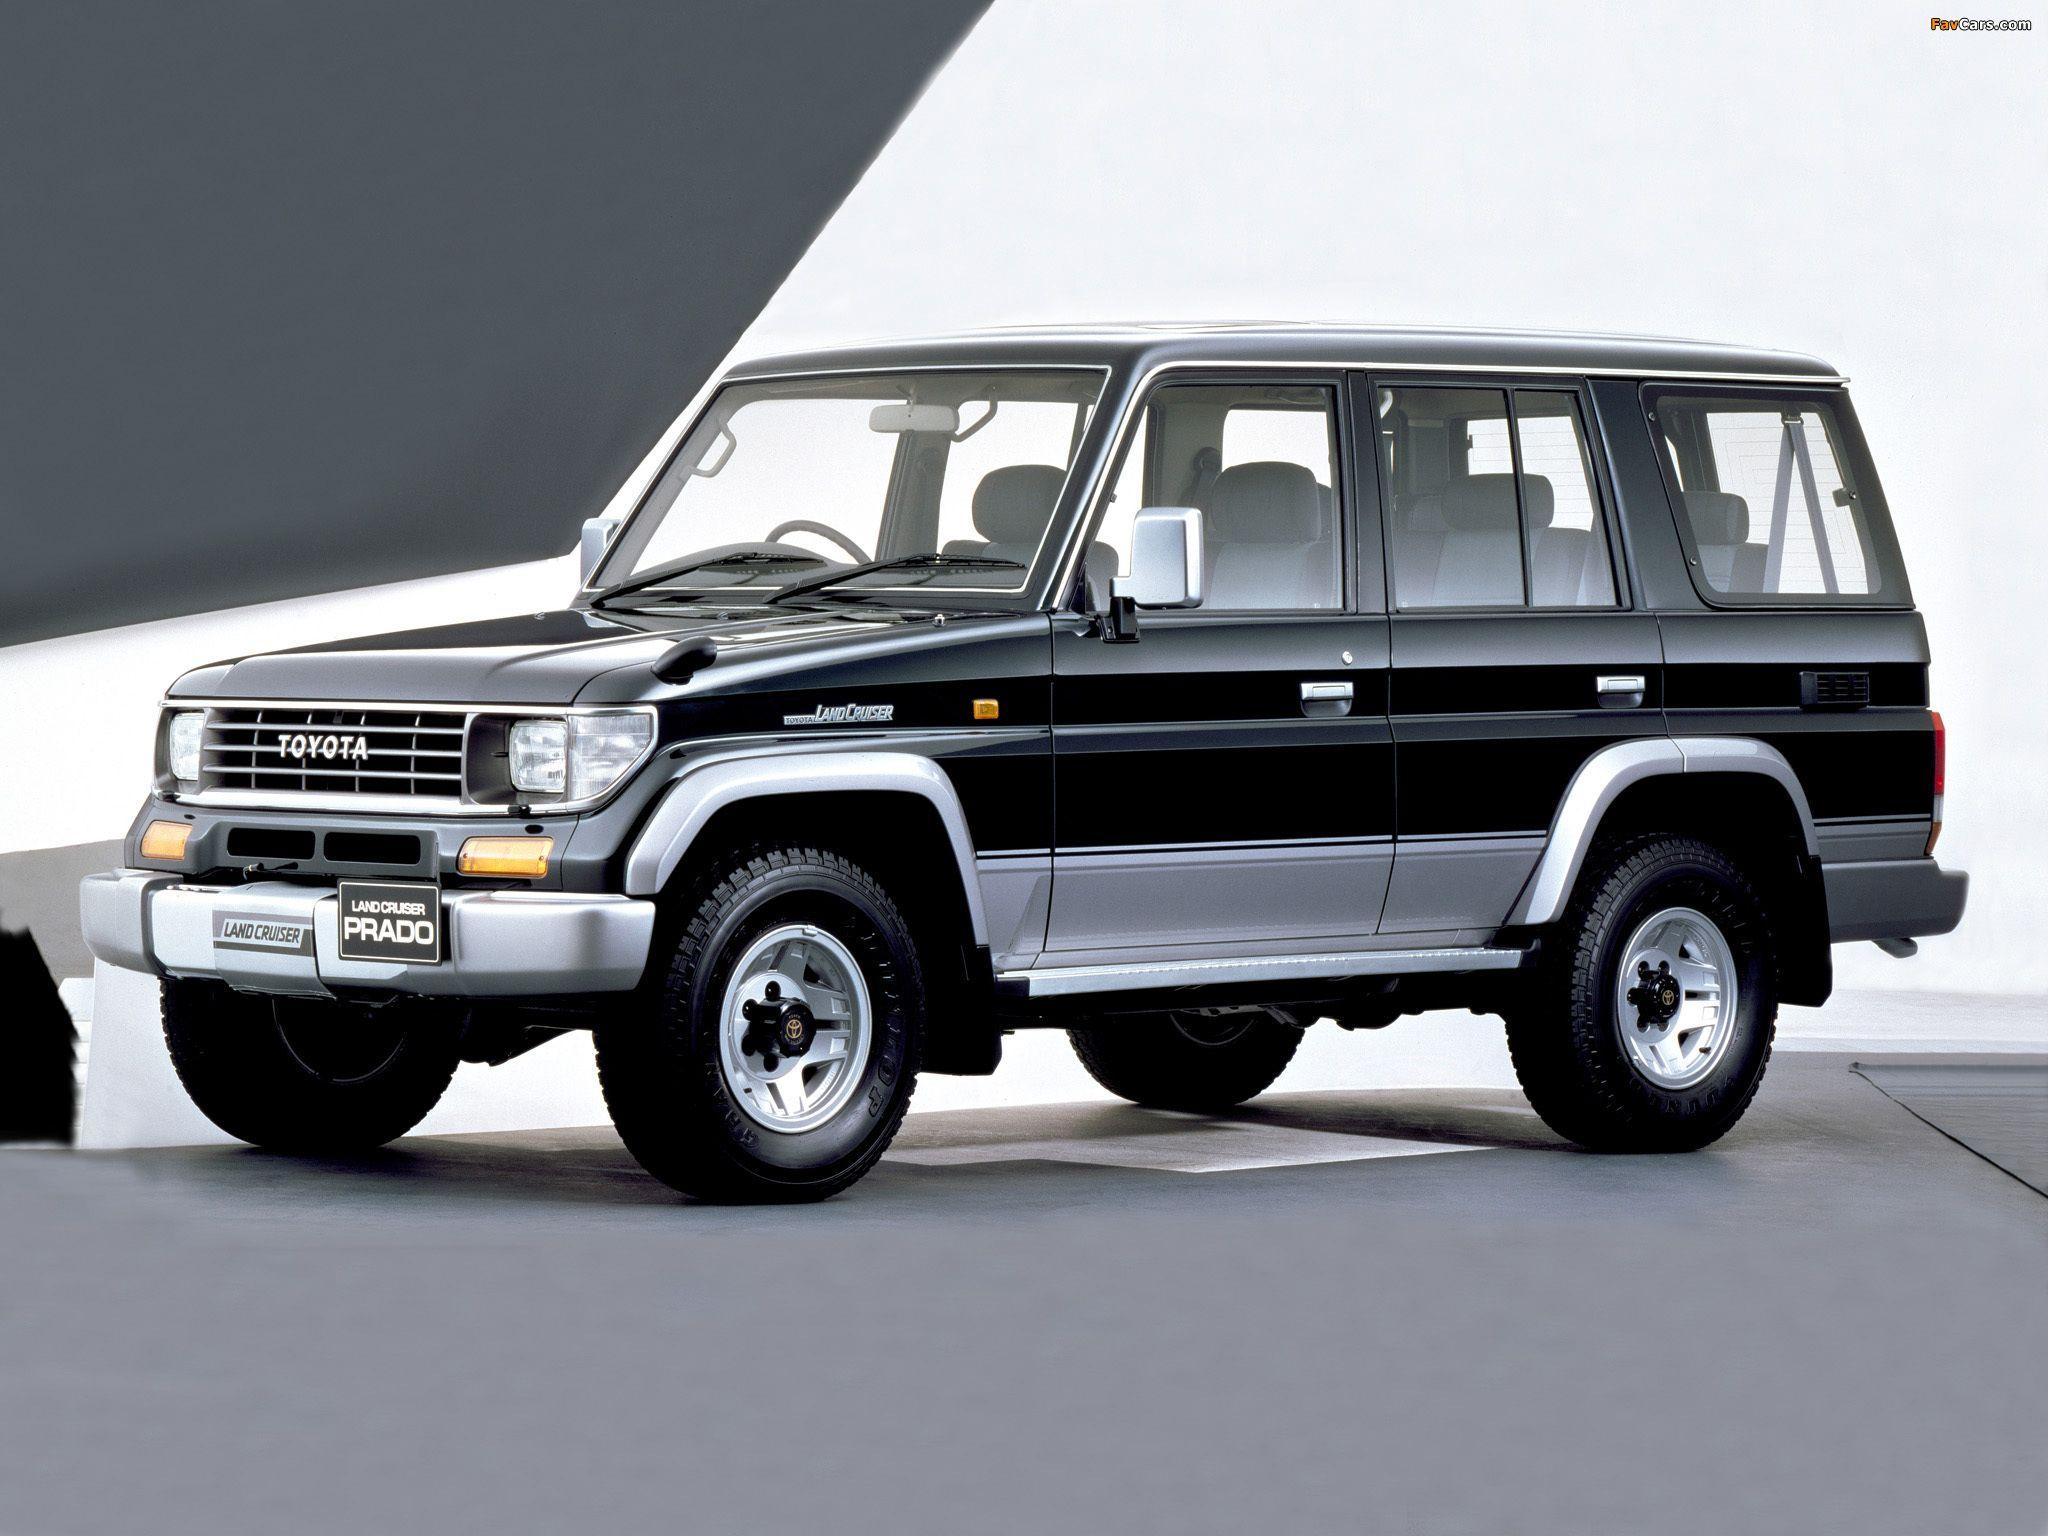 Toyota Land Cruiser Prado (J78) 199096 SUV Art